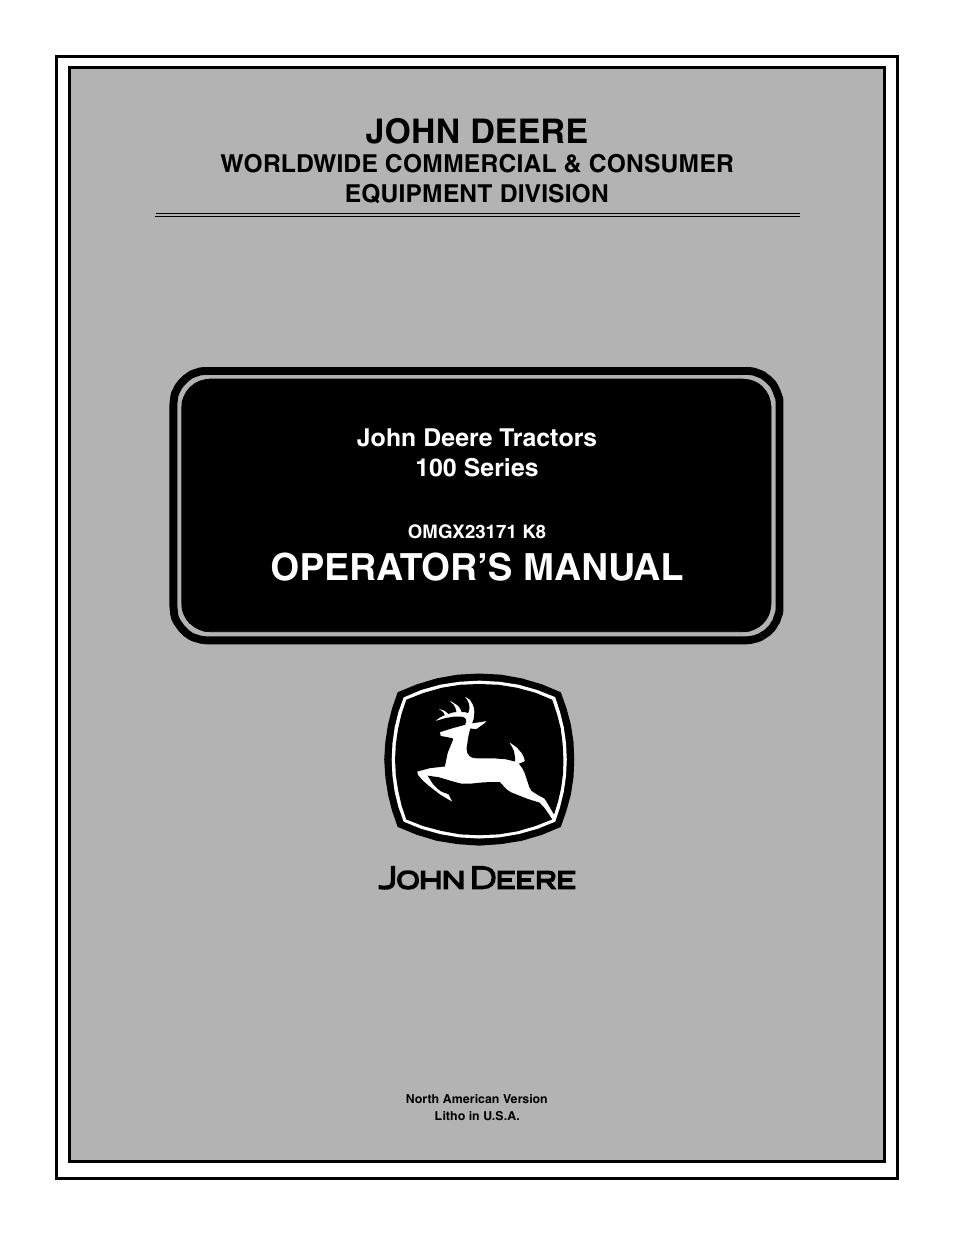 John Deere La105 User Manual 52 Pages Also For Tractors 100 Series La115 La125 La135 La145 La155 La165 La175